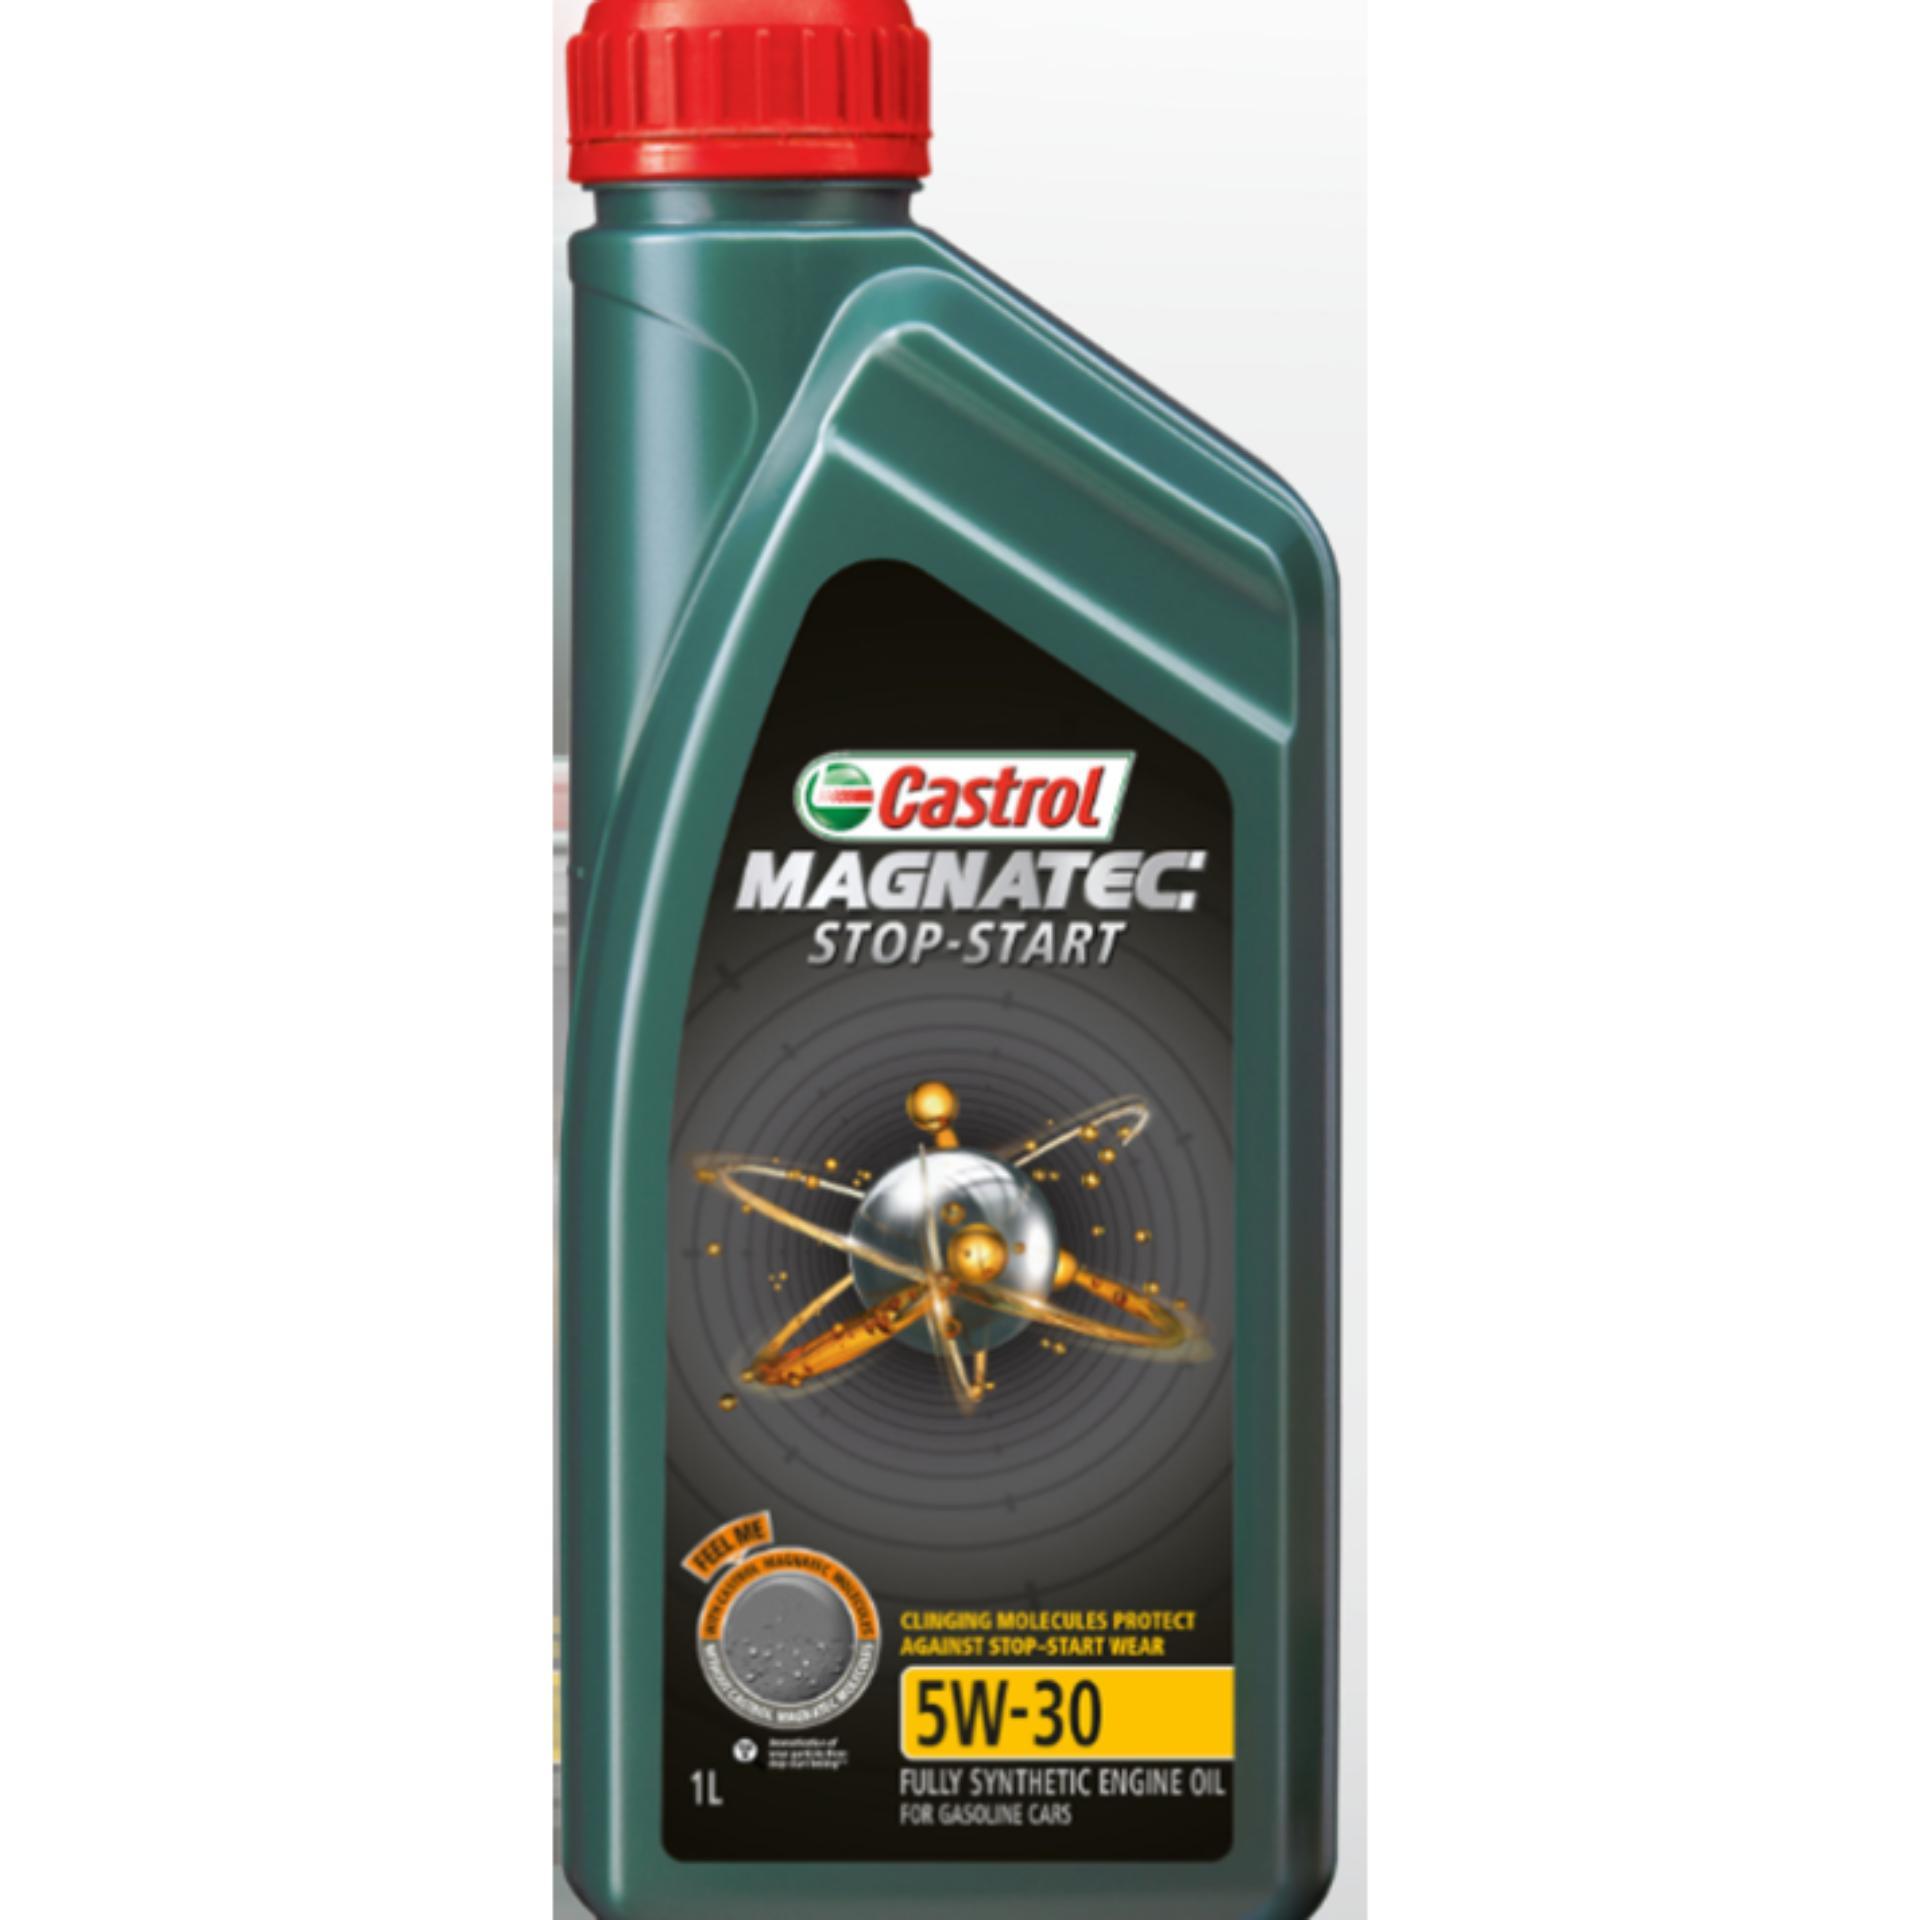 Daftar Harga Castrol Oli Mesin Mobil Magnatec 5w30 Stop Start 1 Shell Helix Ultra 5w 40 Api Sn Cf Fully Synthetic Oil Pelumas 4 Liter